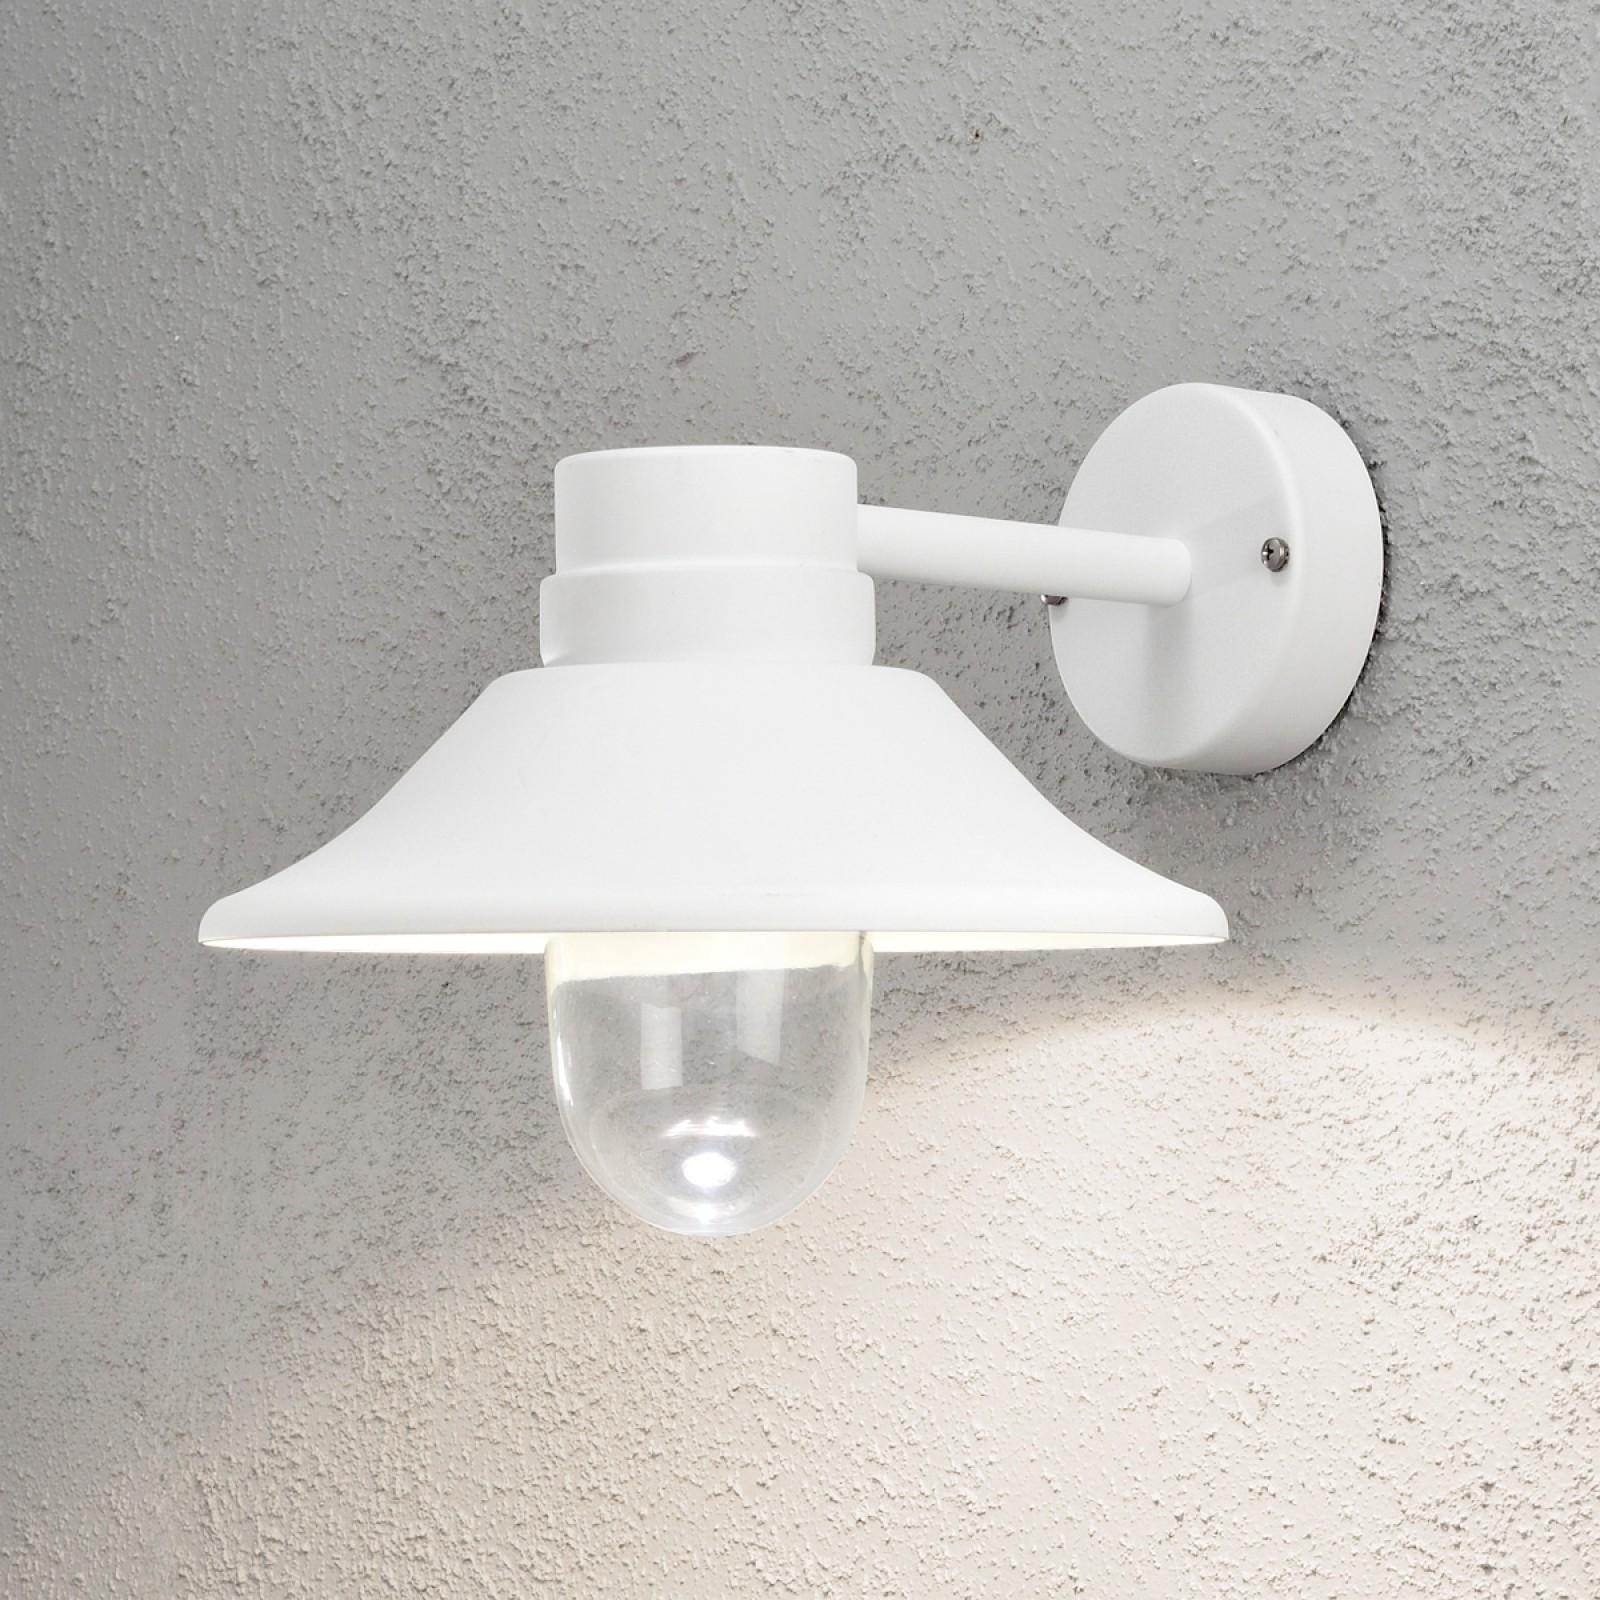 LED-seinävalaisin Vega 412-250 290x360x265 mm valkoinen 4198f30a62